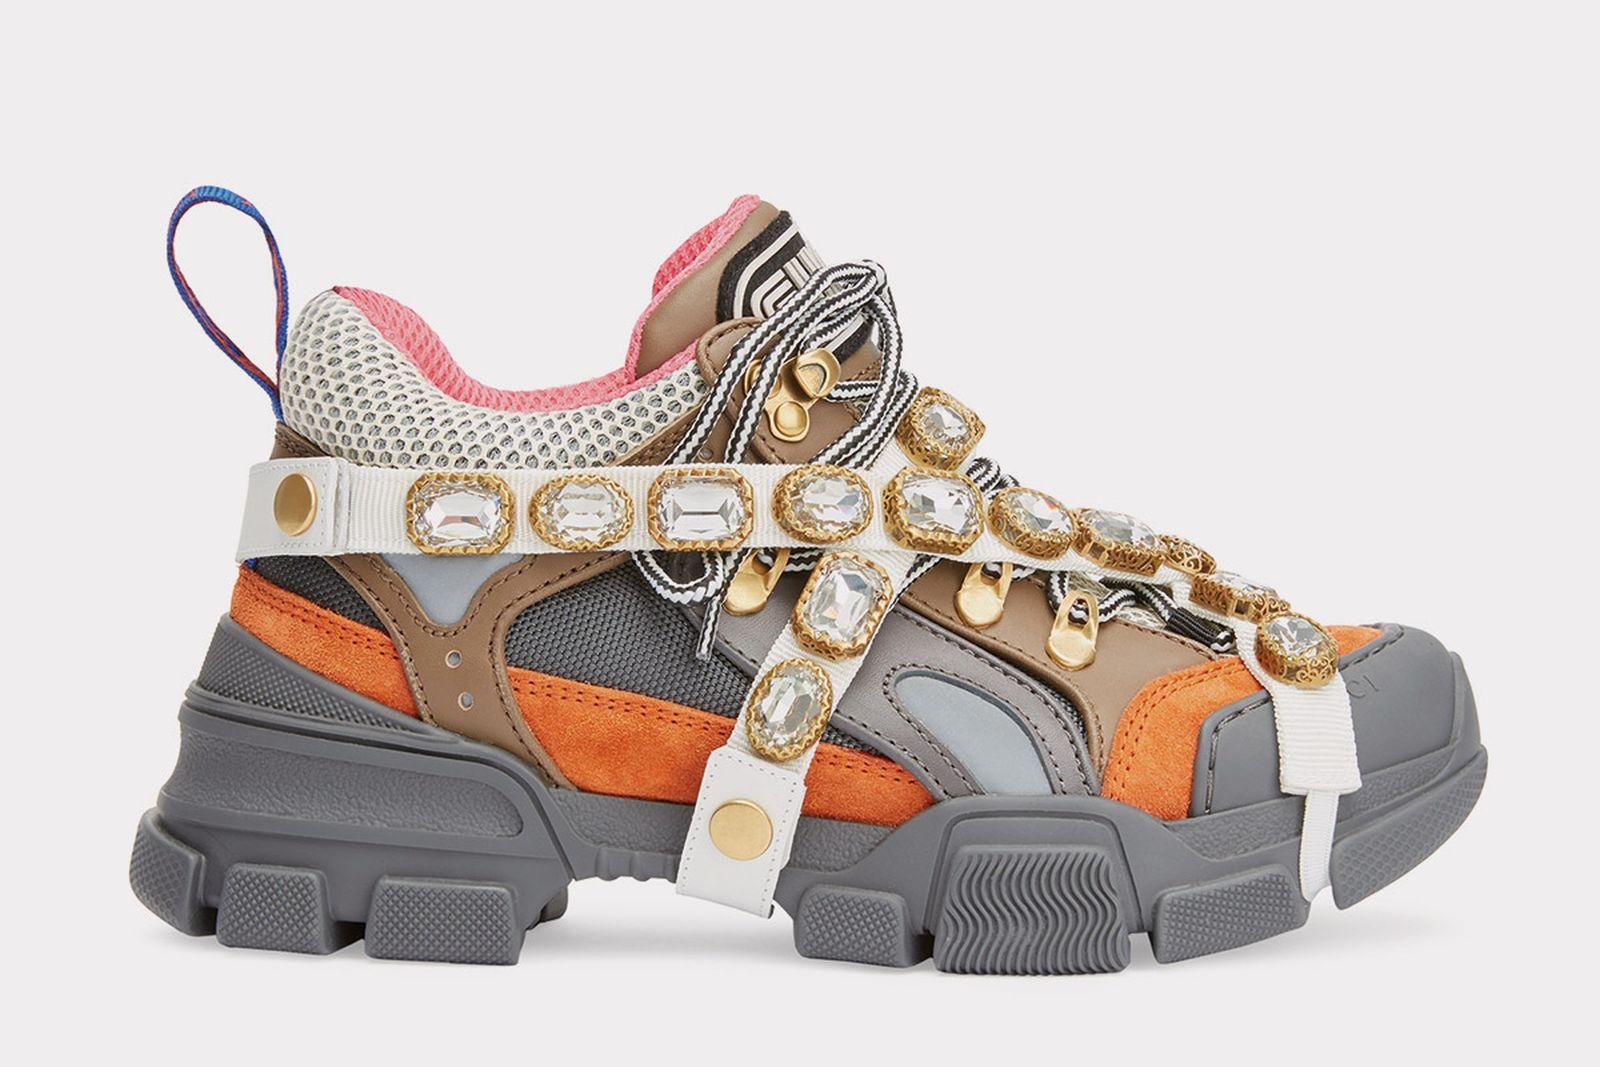 gucci-sega-crystal-sneaker-release-price-02